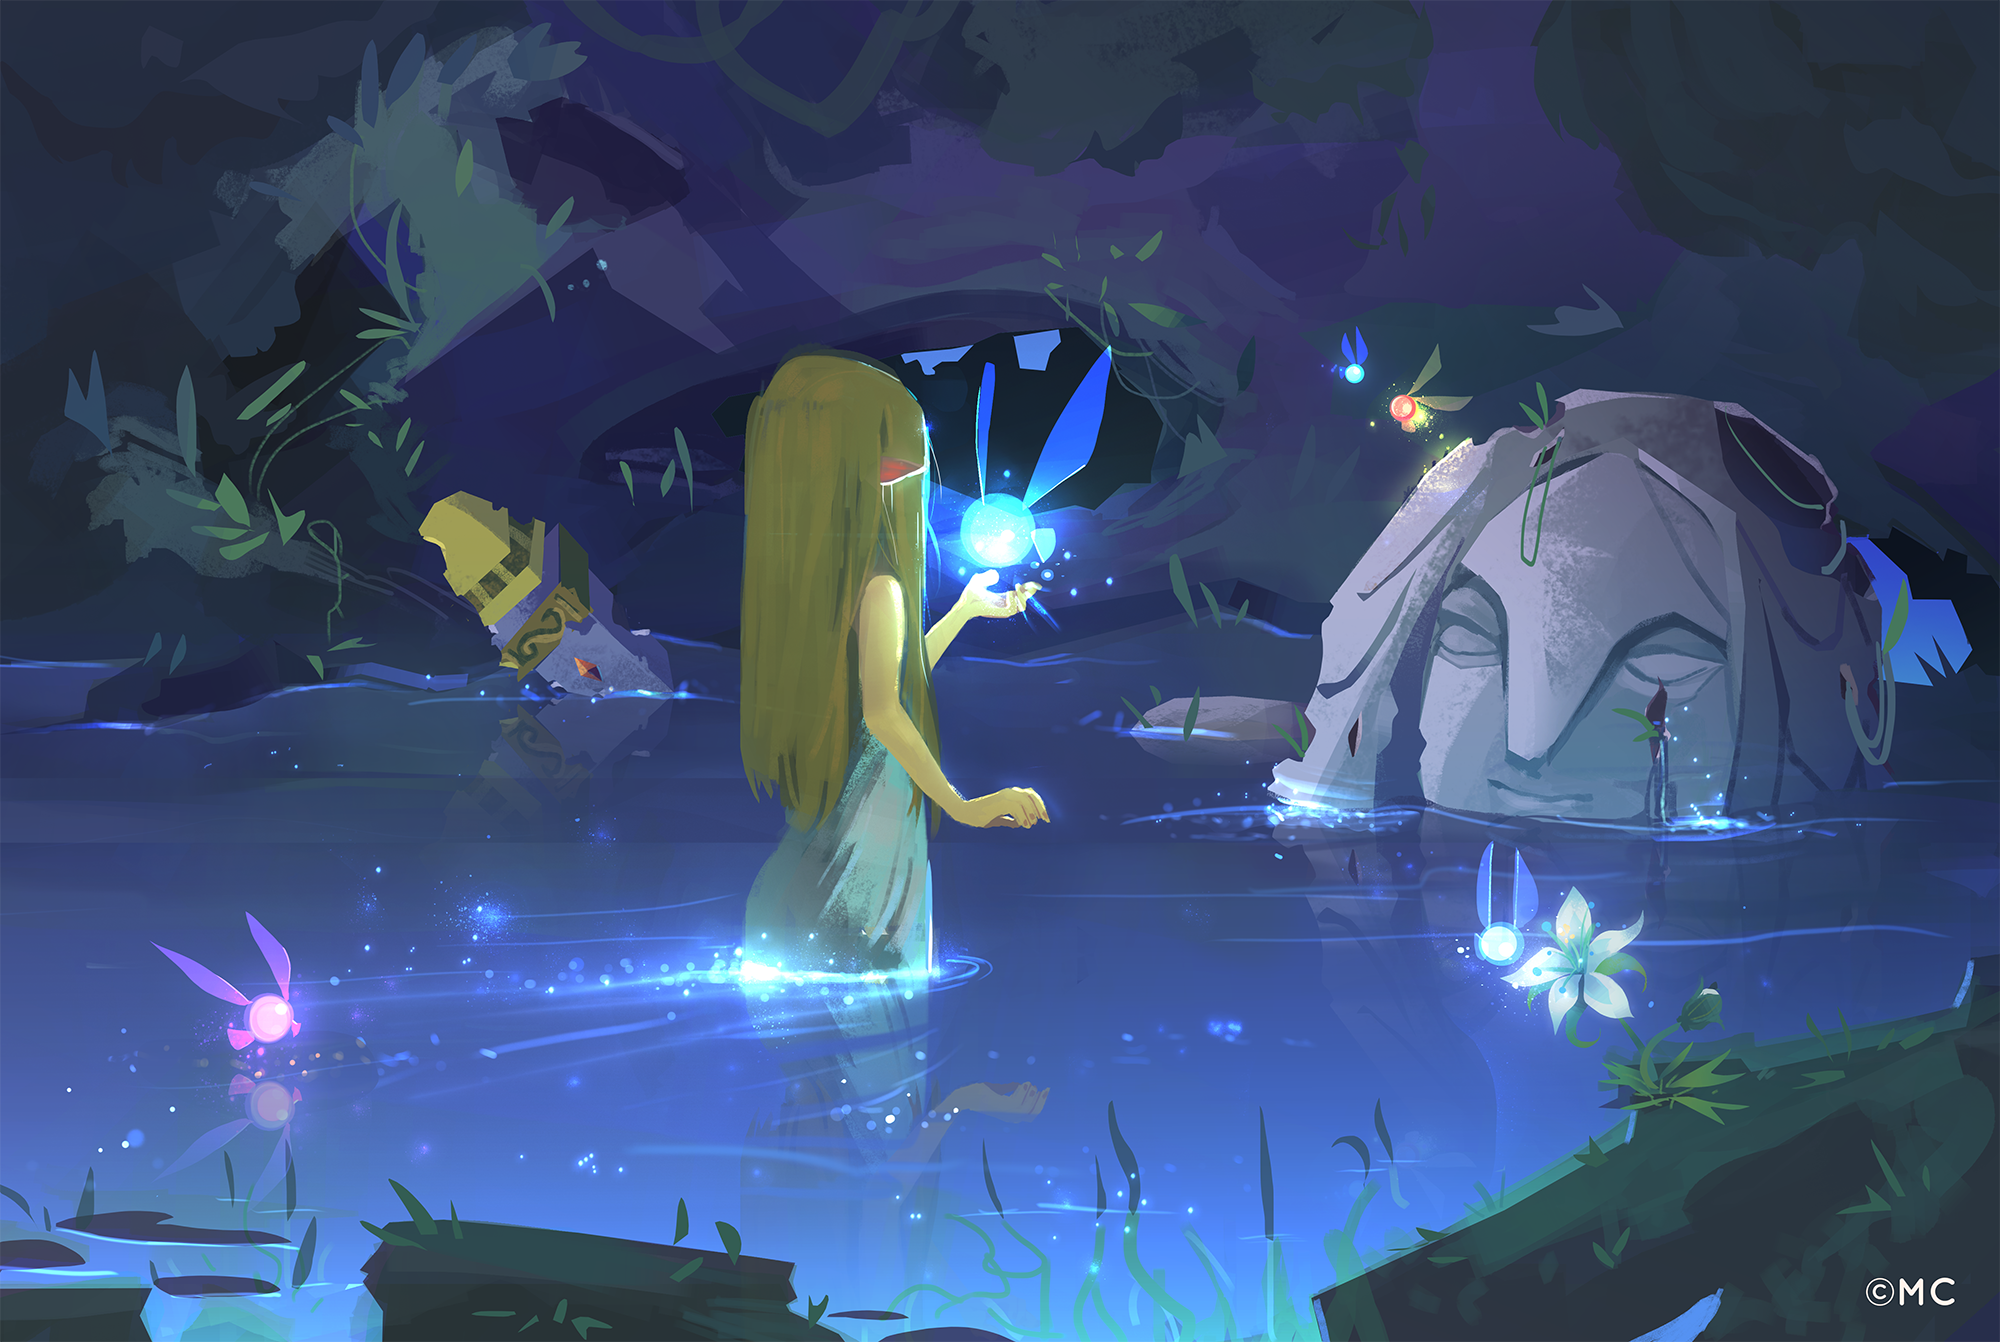 The Legend Of Zelda Breath Of The Wild Fondo De Pantalla Hd